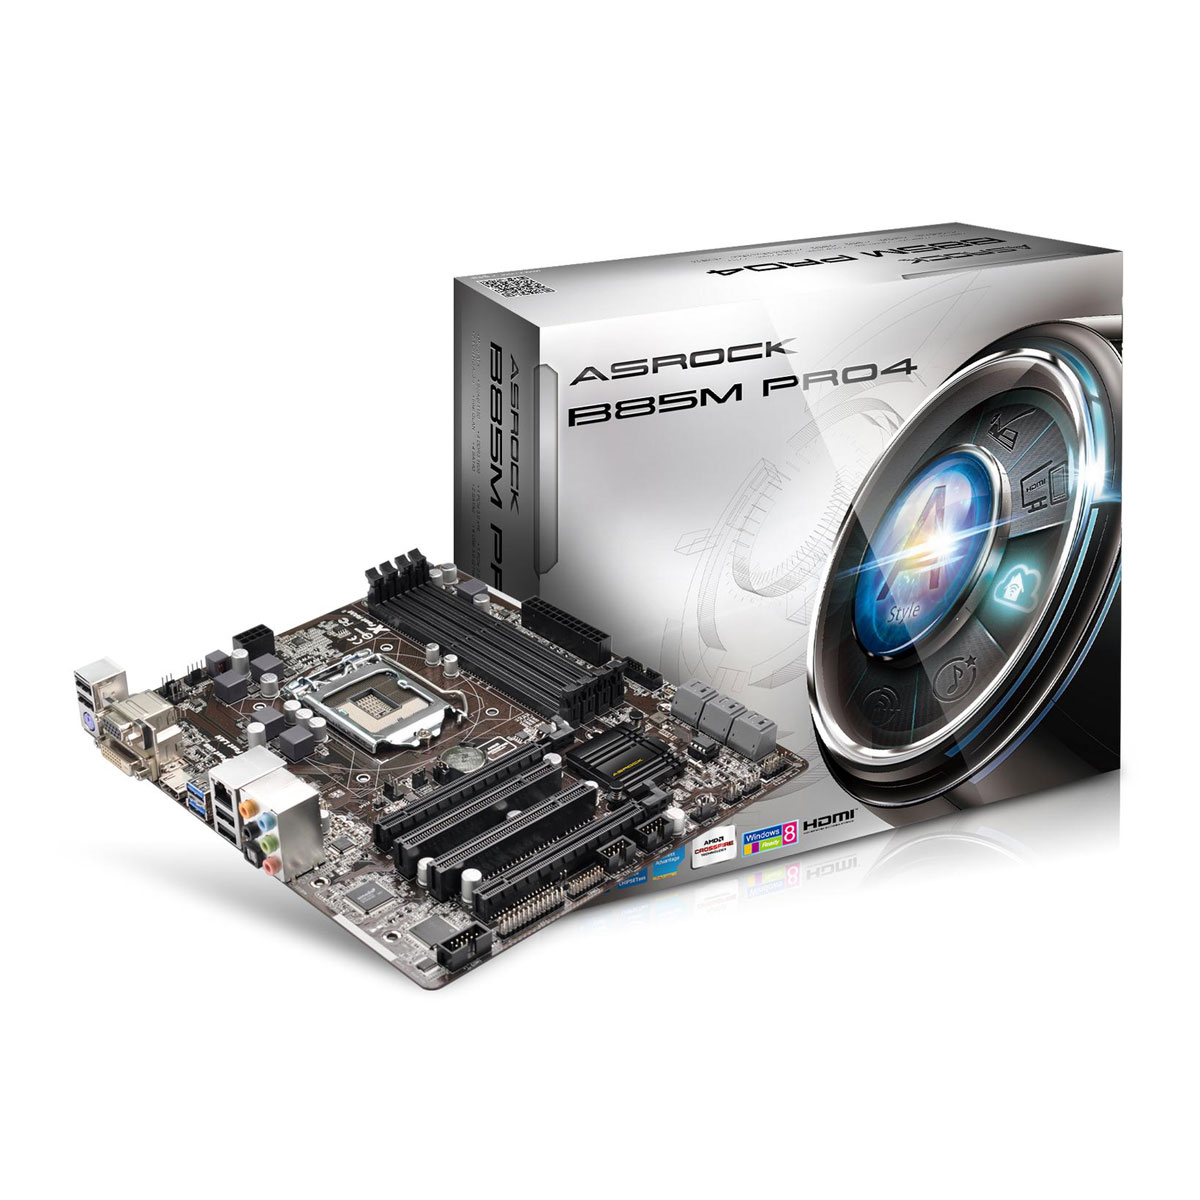 Carte mère ASRock B85M Pro4 Carte mère Micro ATX Socket 1150 Intel B85 Express - SATA 3Gb/s et SATA 6Gb/s - USB 3.0 - 1x PCI-Express 3.0 16x + 1x PCI-Express 2.0 16x